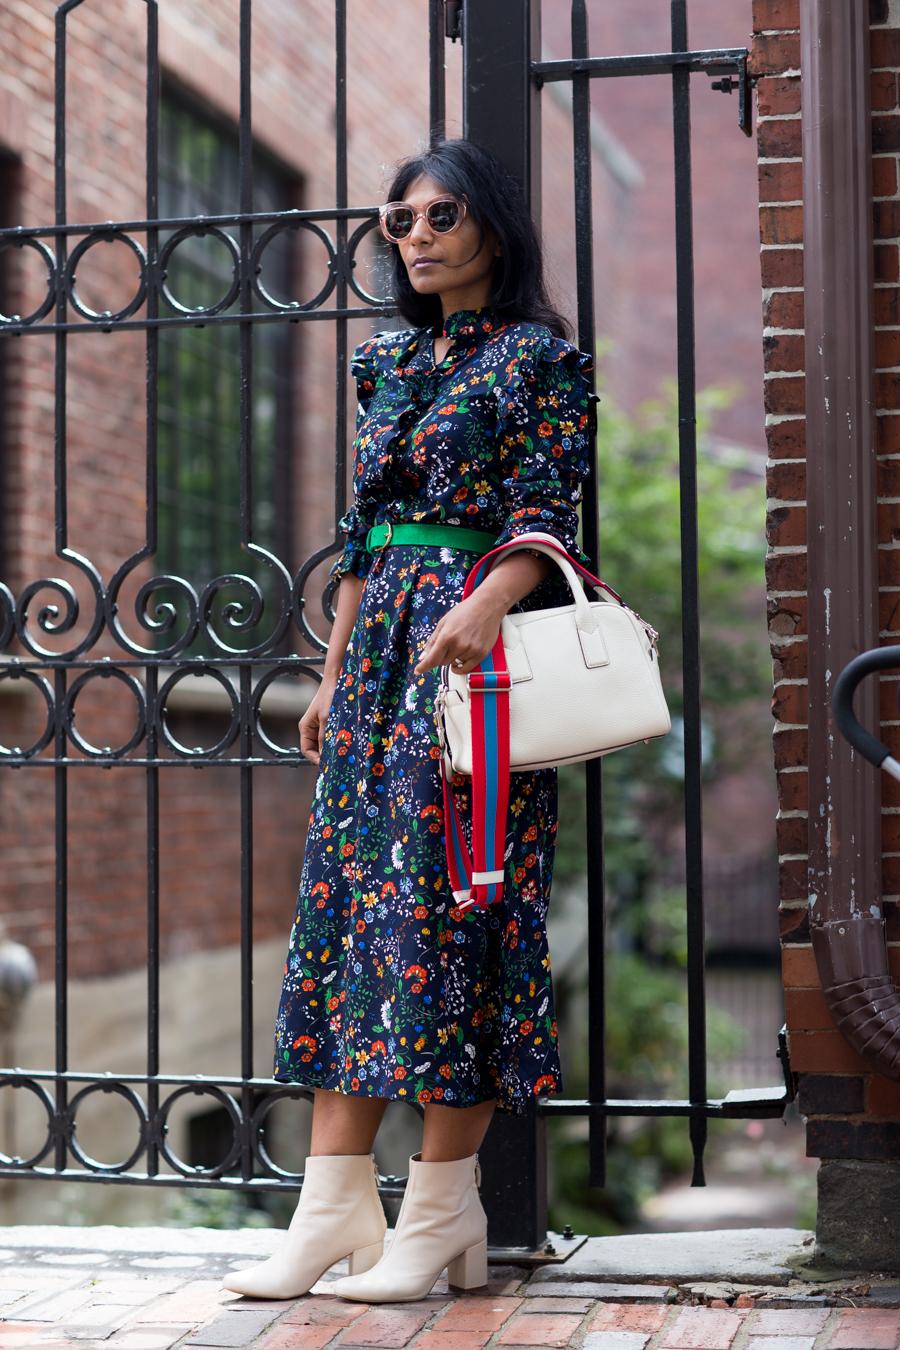 fall fashion, mididress, european style, edgy, afforable style, petite style, petite blogger, h&m, banana republic, marc jacobs, style tips